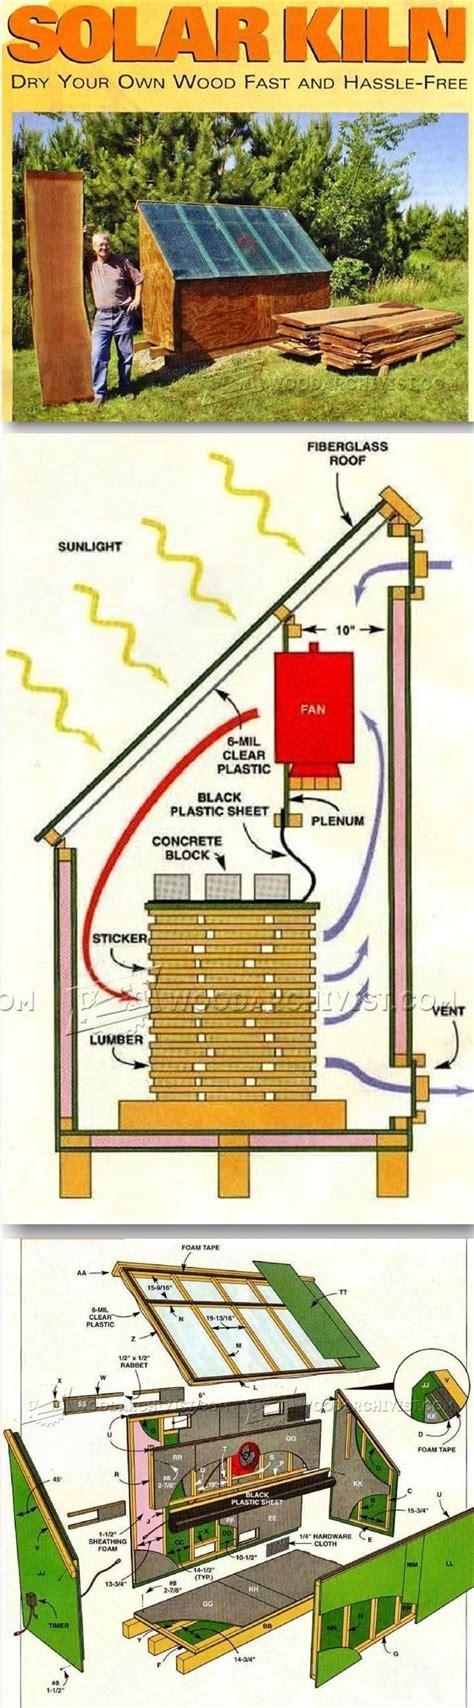 solar kiln plans woodworking tips  techniques